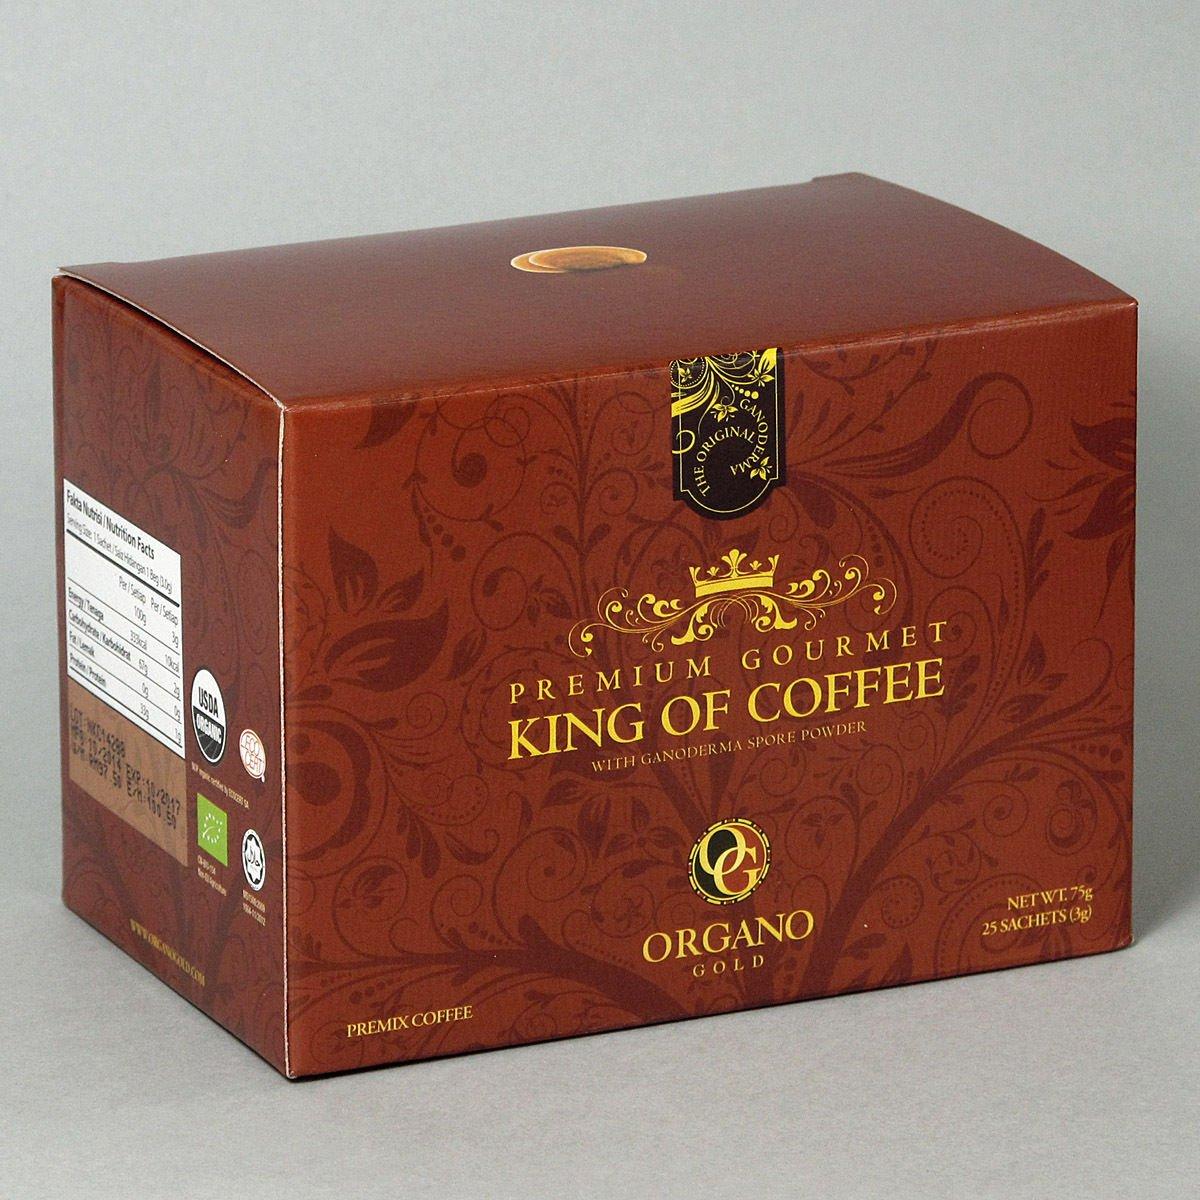 5 Boxes Organo Gold Premium Gourmet King Of Coffee - 25 sachets/box